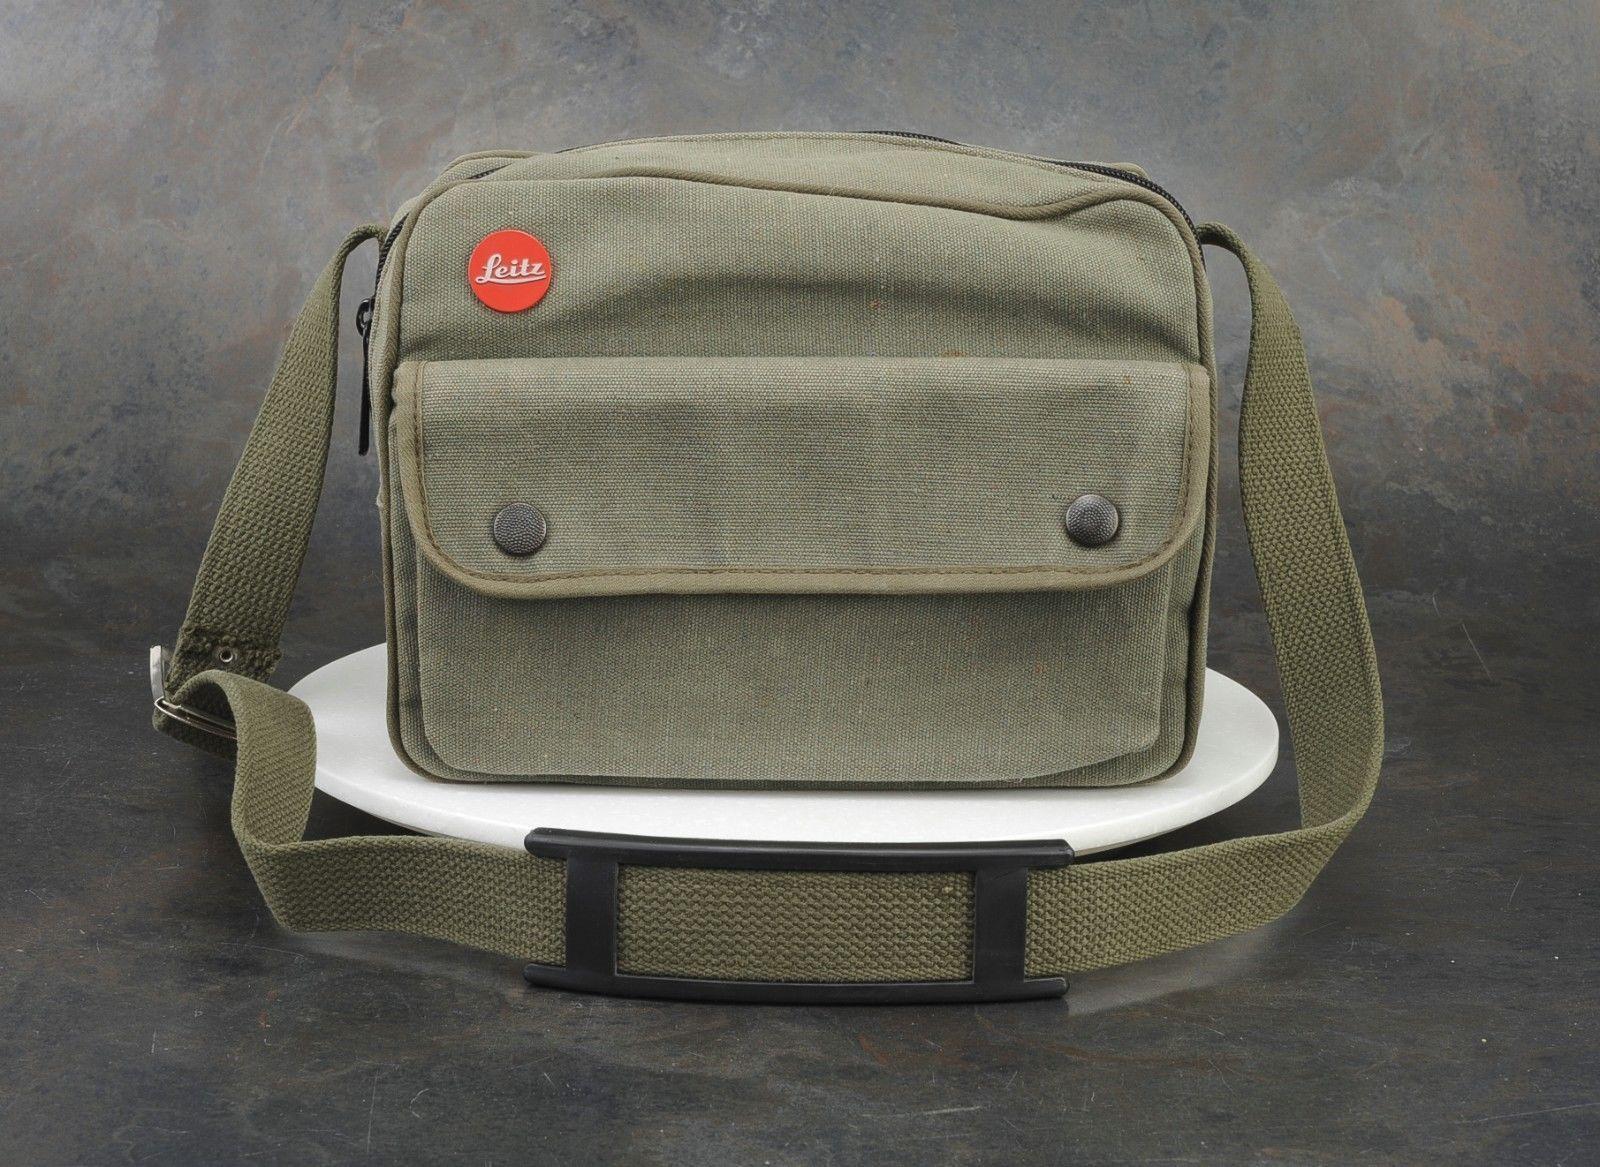 Leica Safari Edition Canvas Camera Bag for R3 Olive Green Shoulder Strap  031bfe3374e86